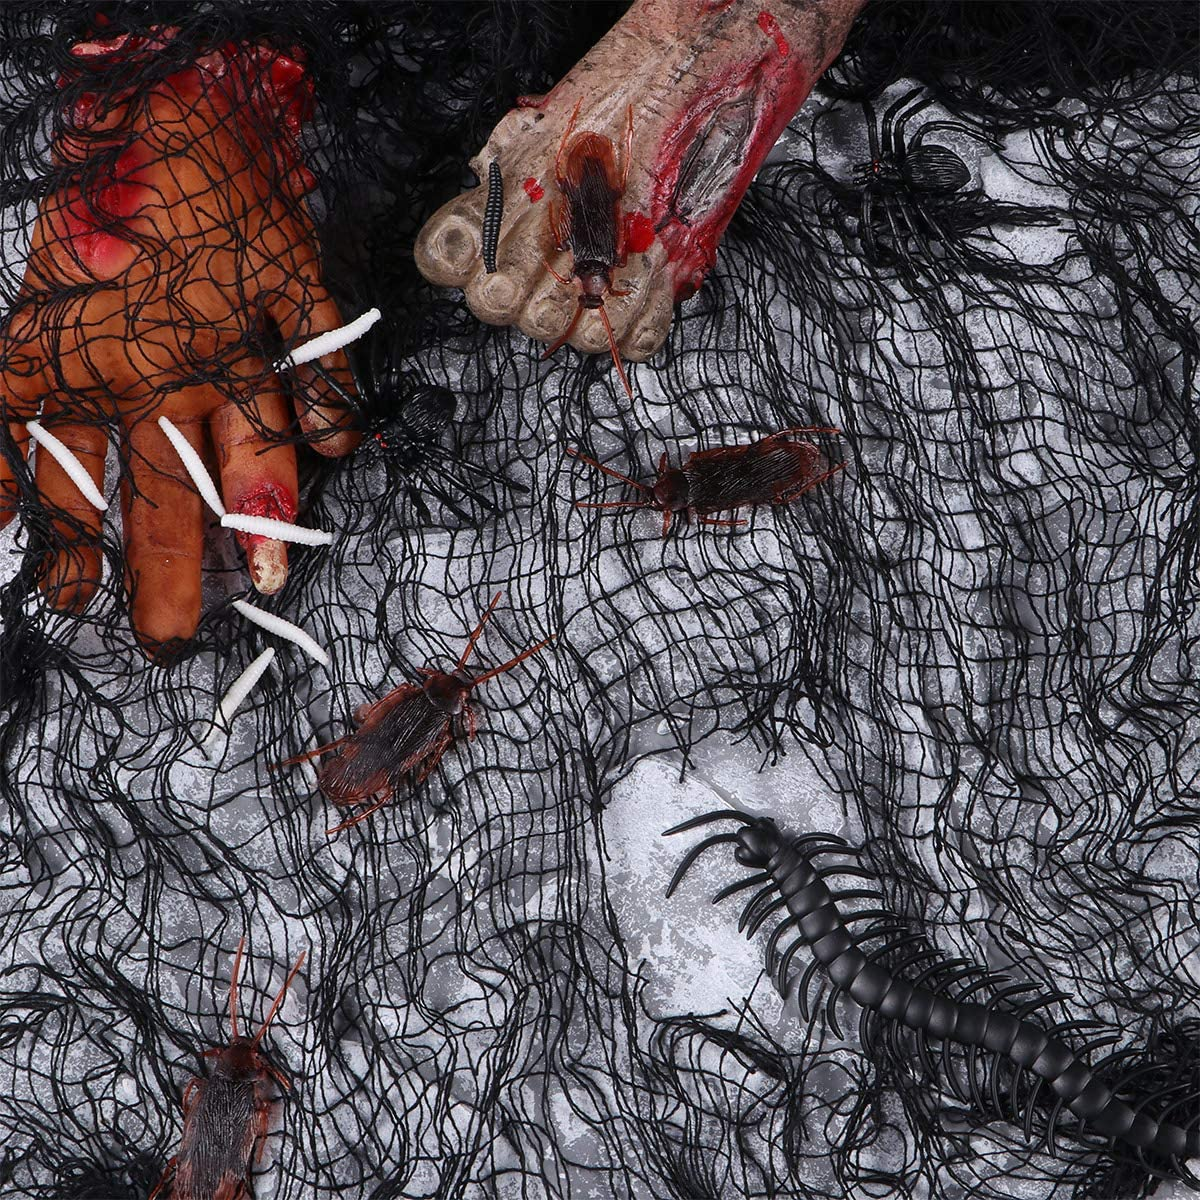 Halloween Haunted House Creepy Cloth Decoration Gauze for Halloween Decor 3PCS, Black